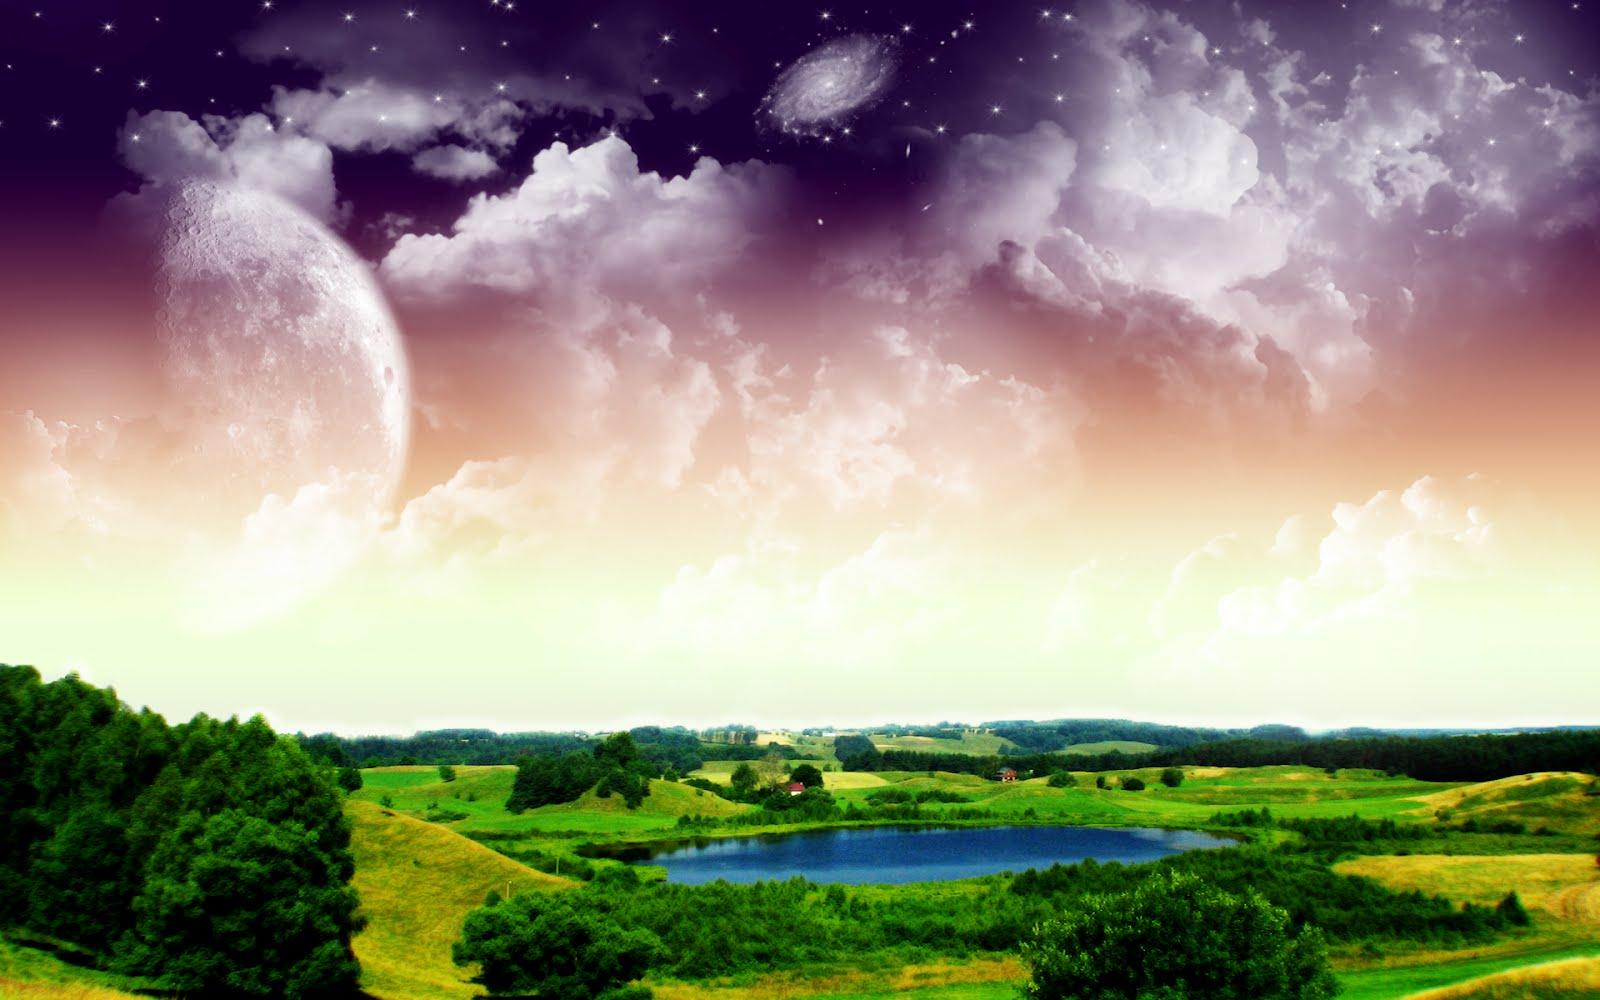 3d Nature, Hd Nature Wallpapers For Desktop Background - Full Hd 3d Hd Wallpapers Background - HD Wallpaper